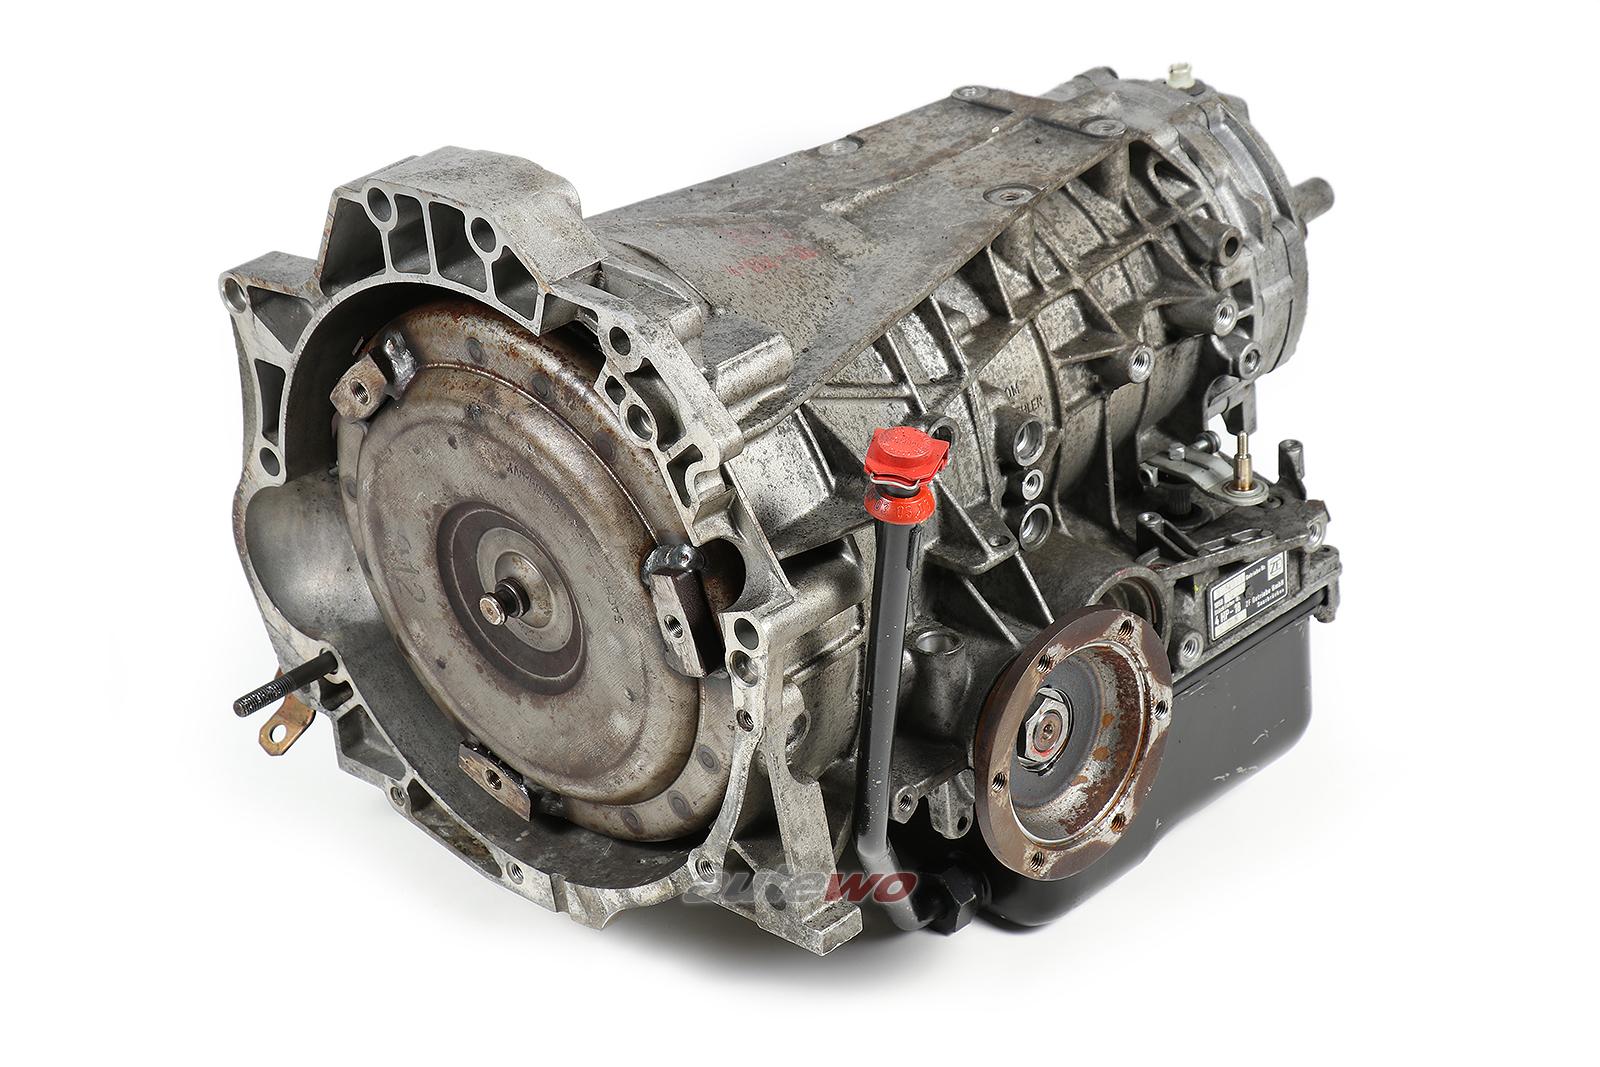 01K300041DX Audi 100 C4 2.5l TDI Automatikgetriebe CDS 0032008 163400km